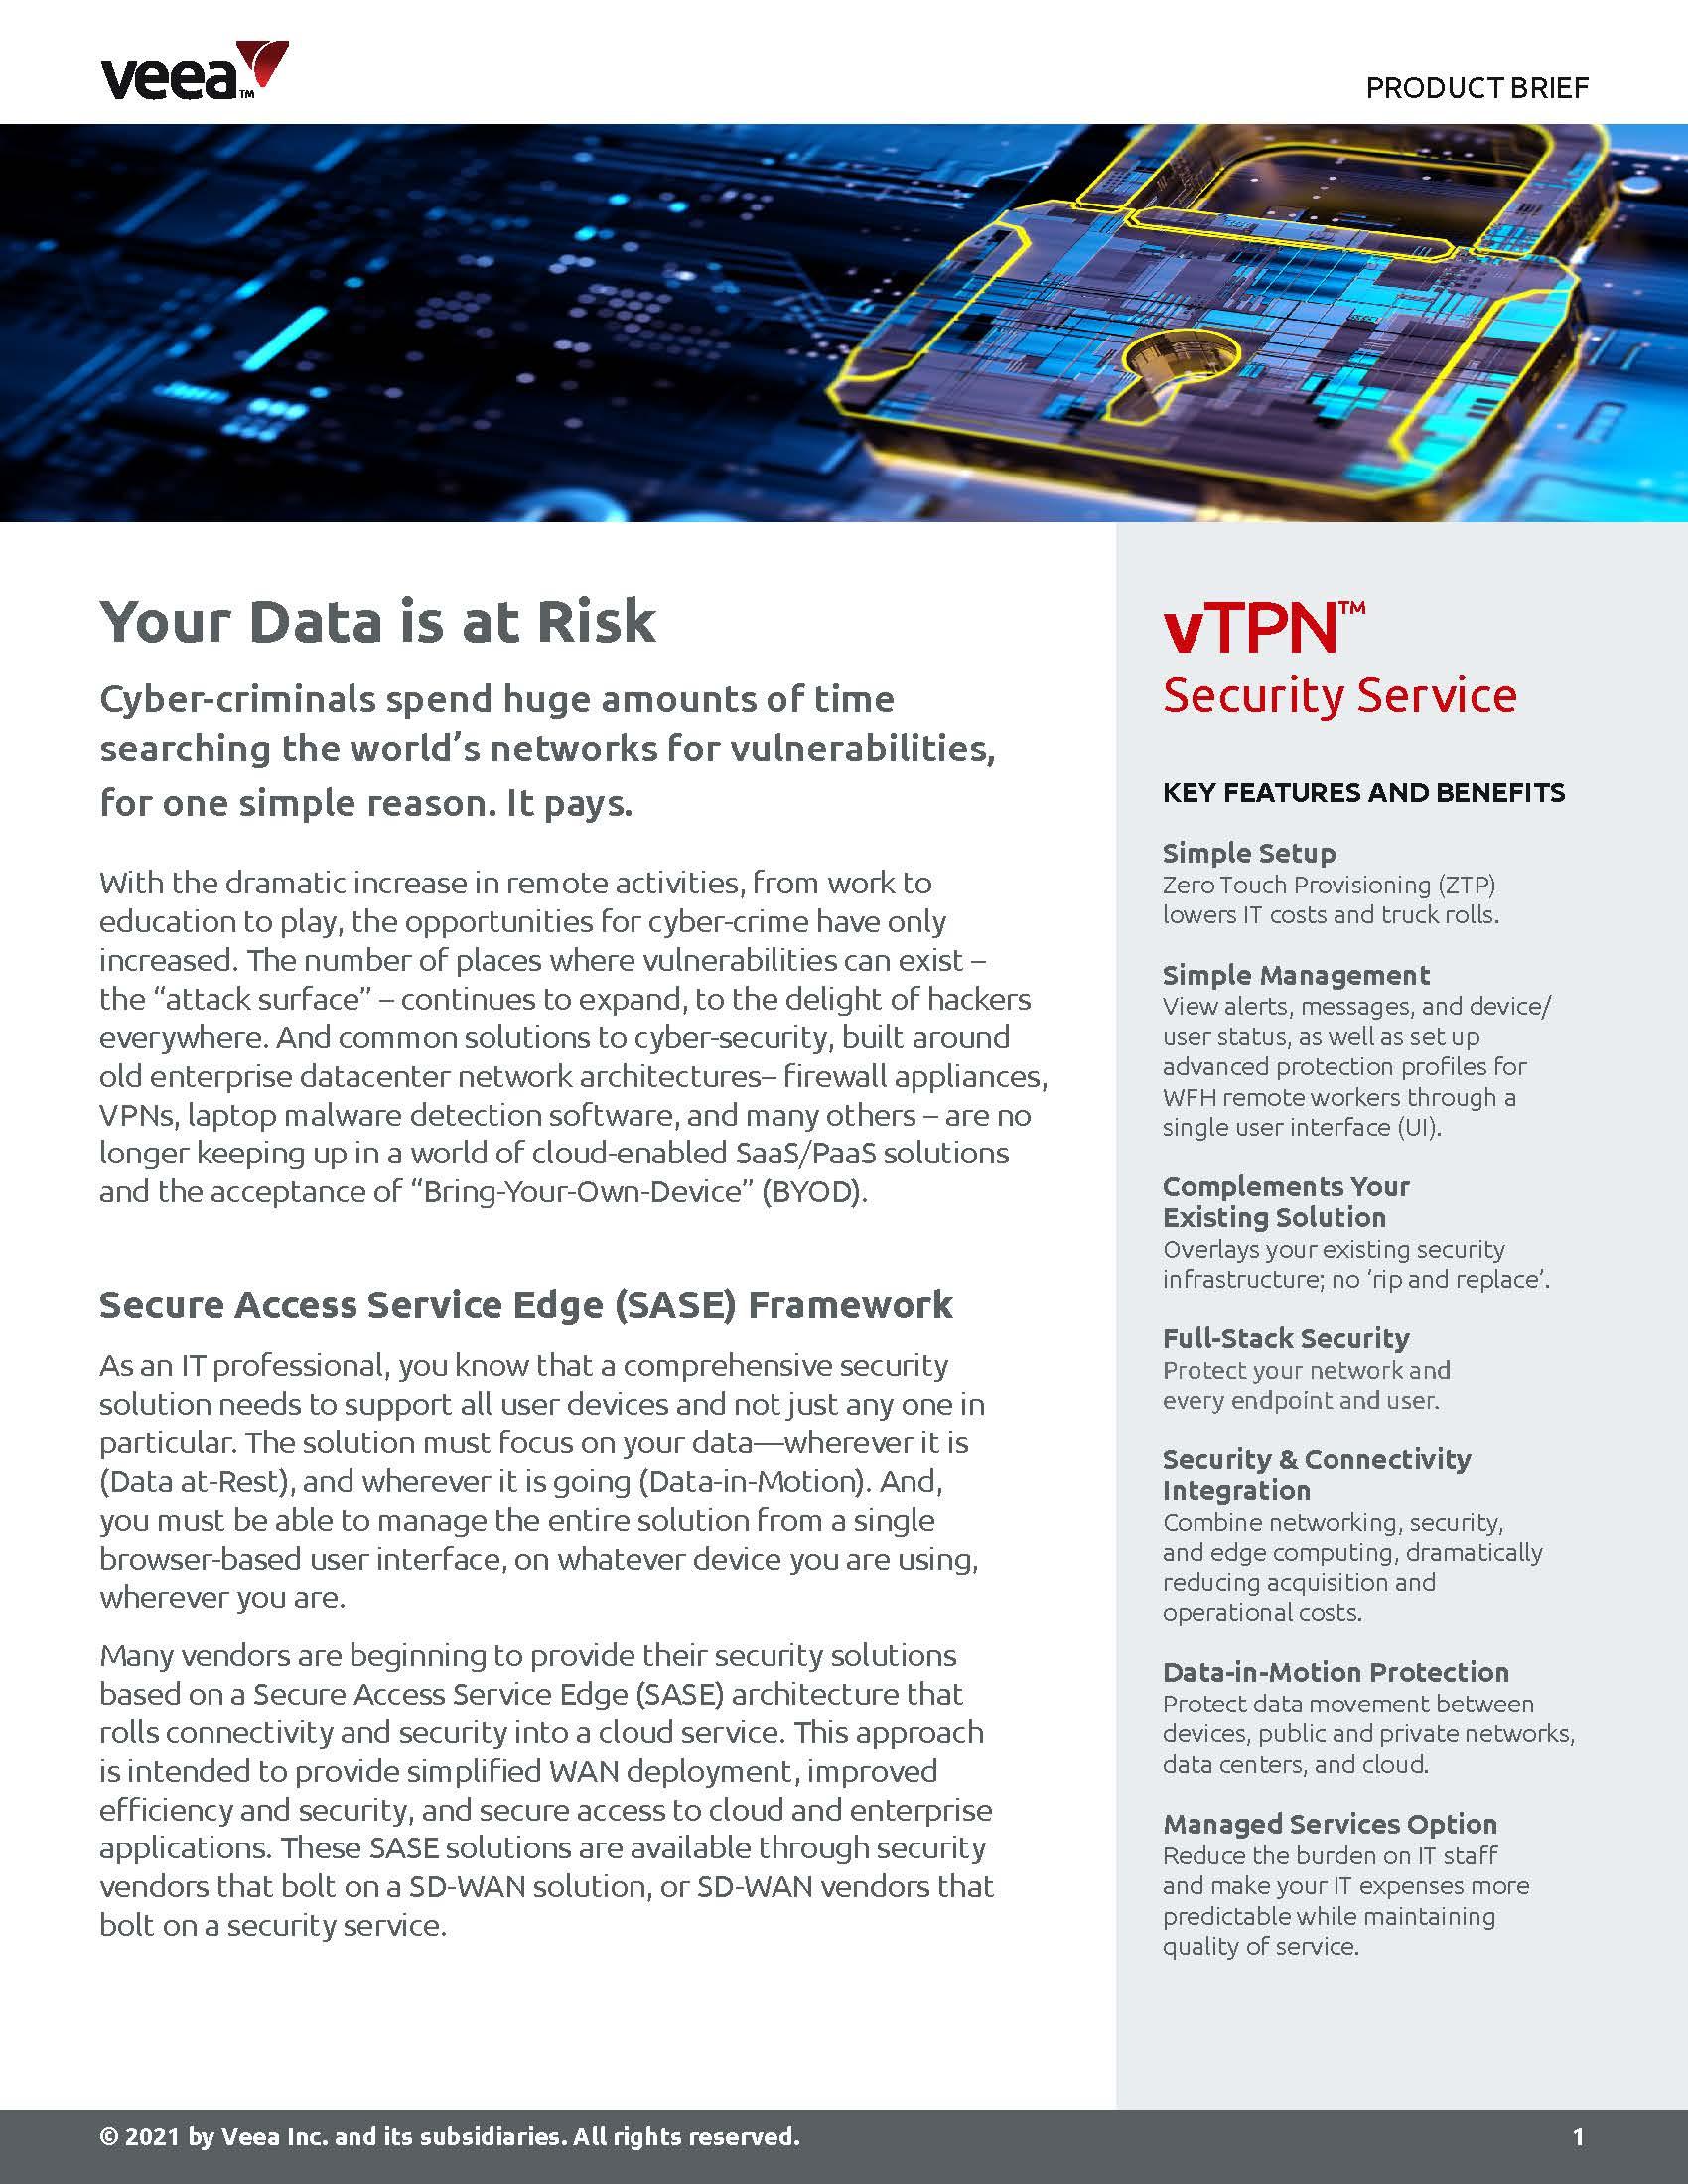 vTPN Product Brief cover